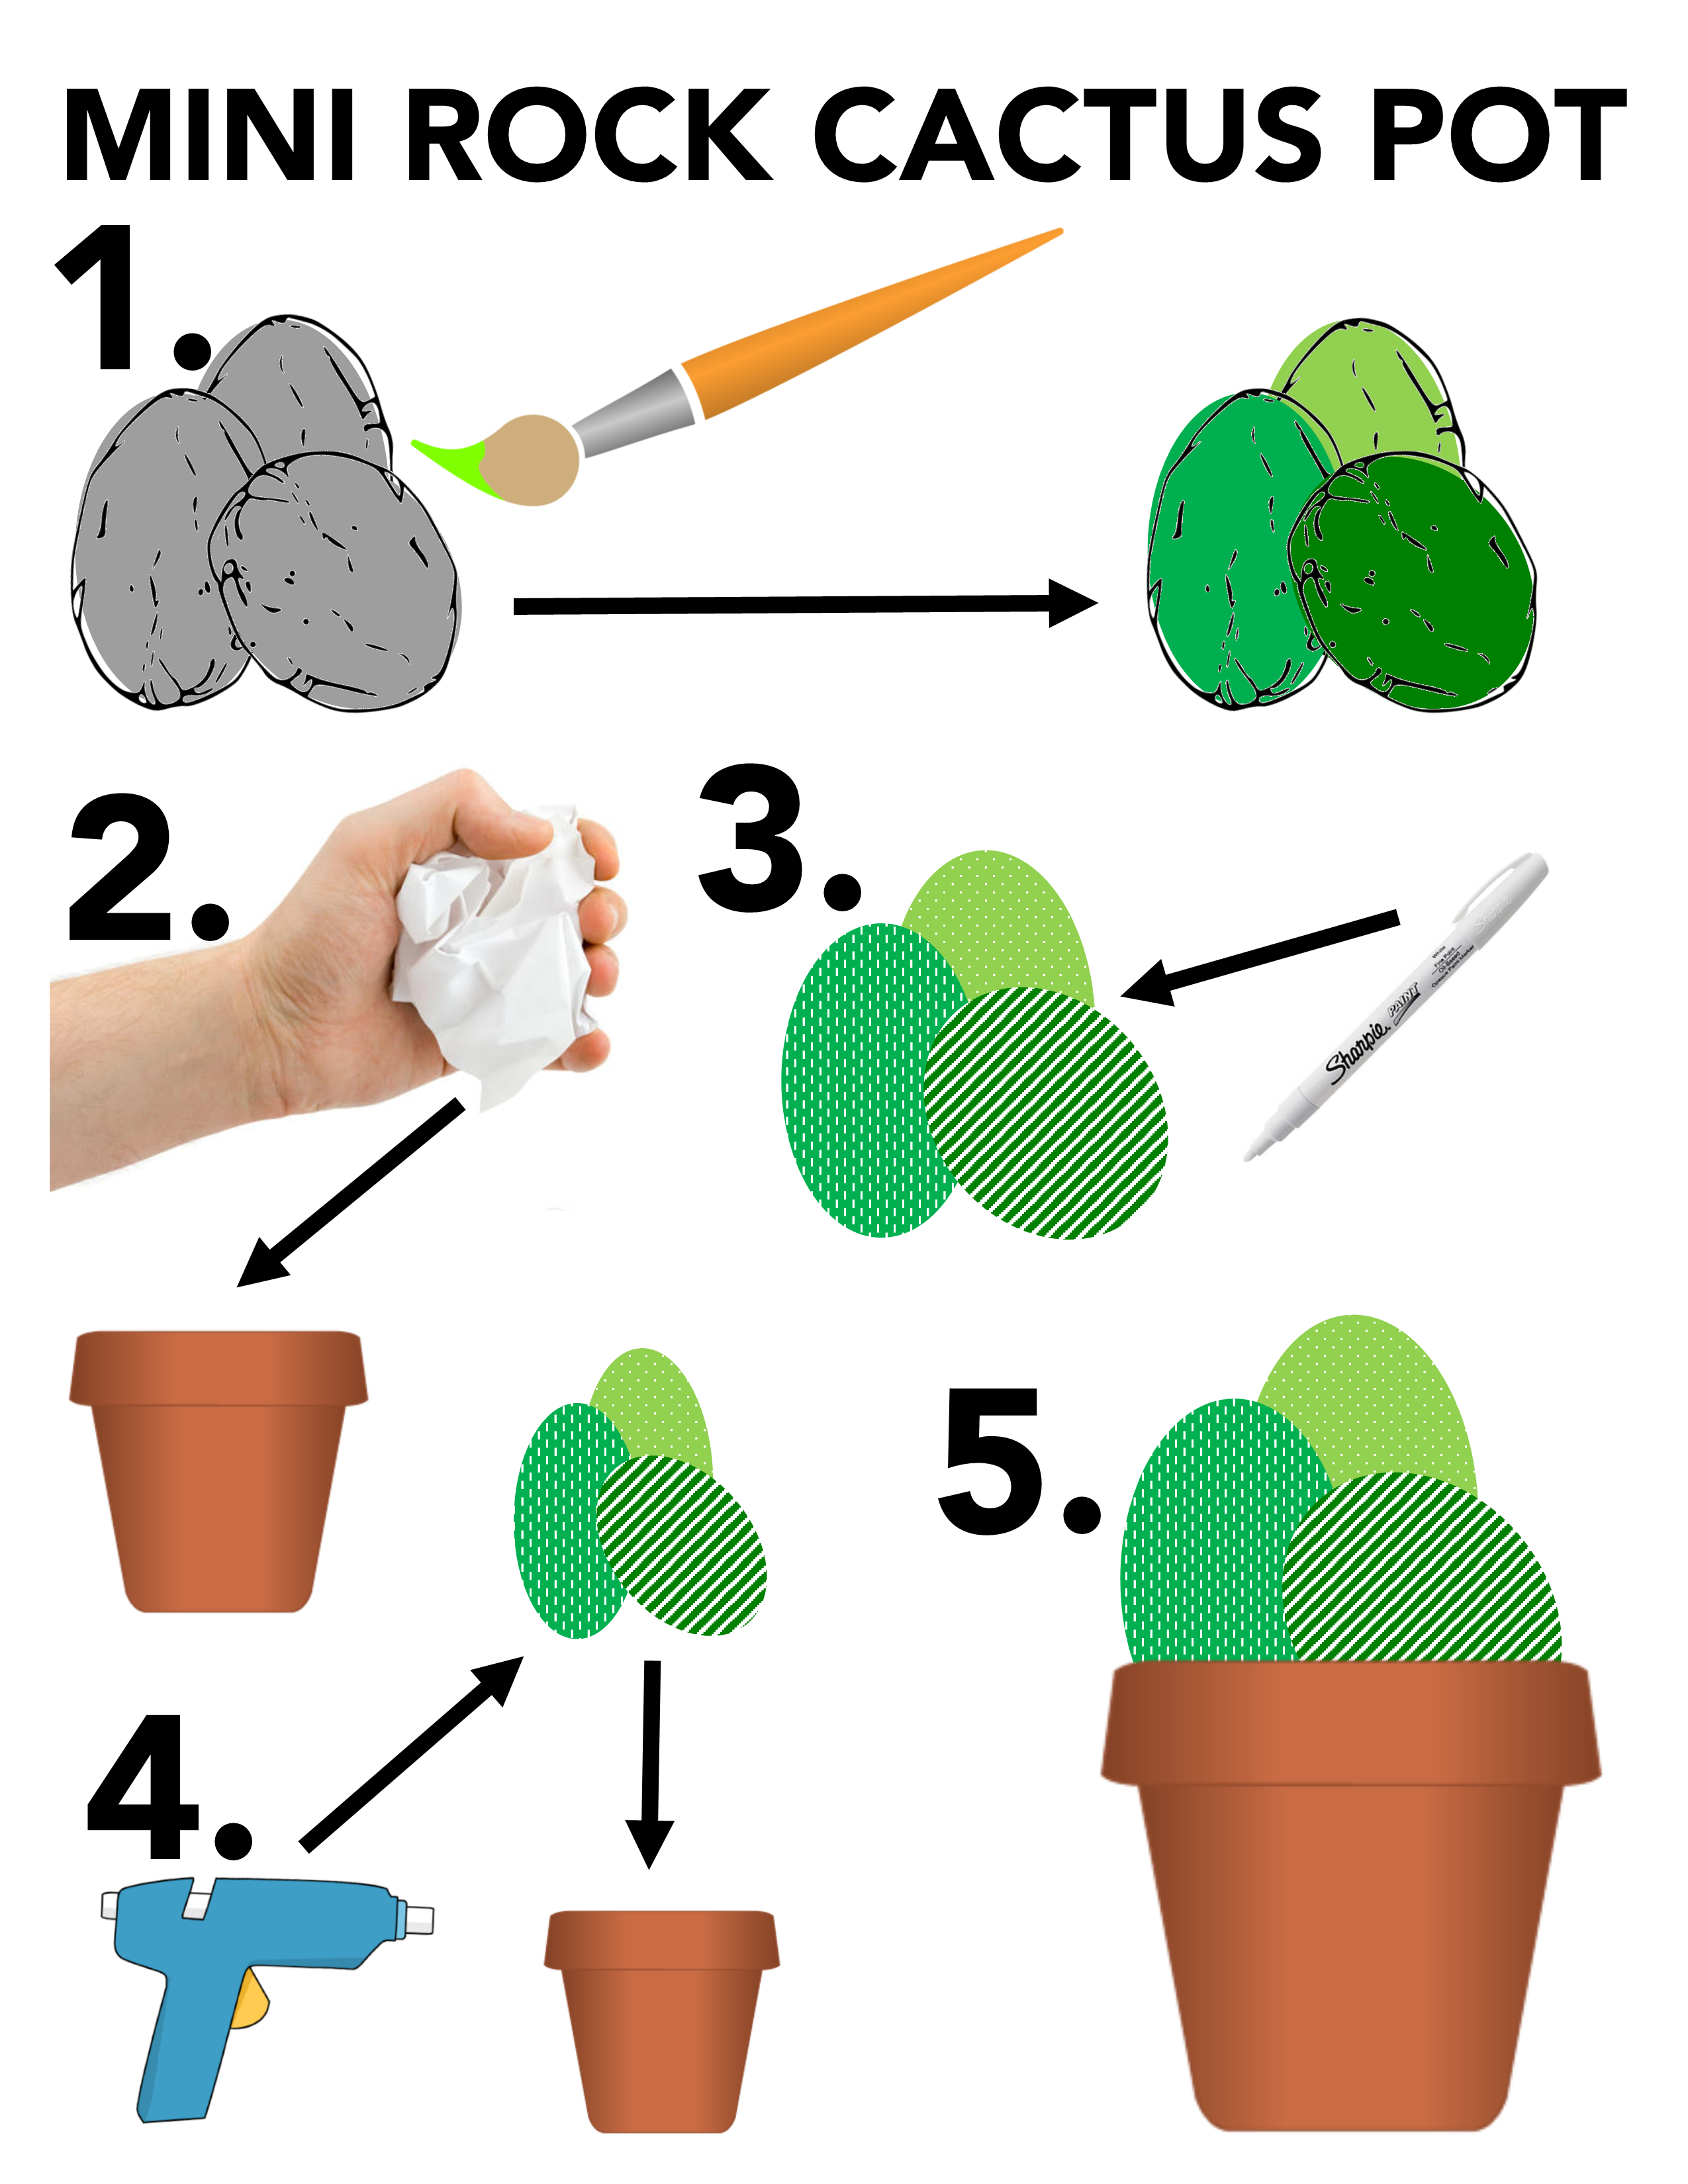 rock cactus pot infographic